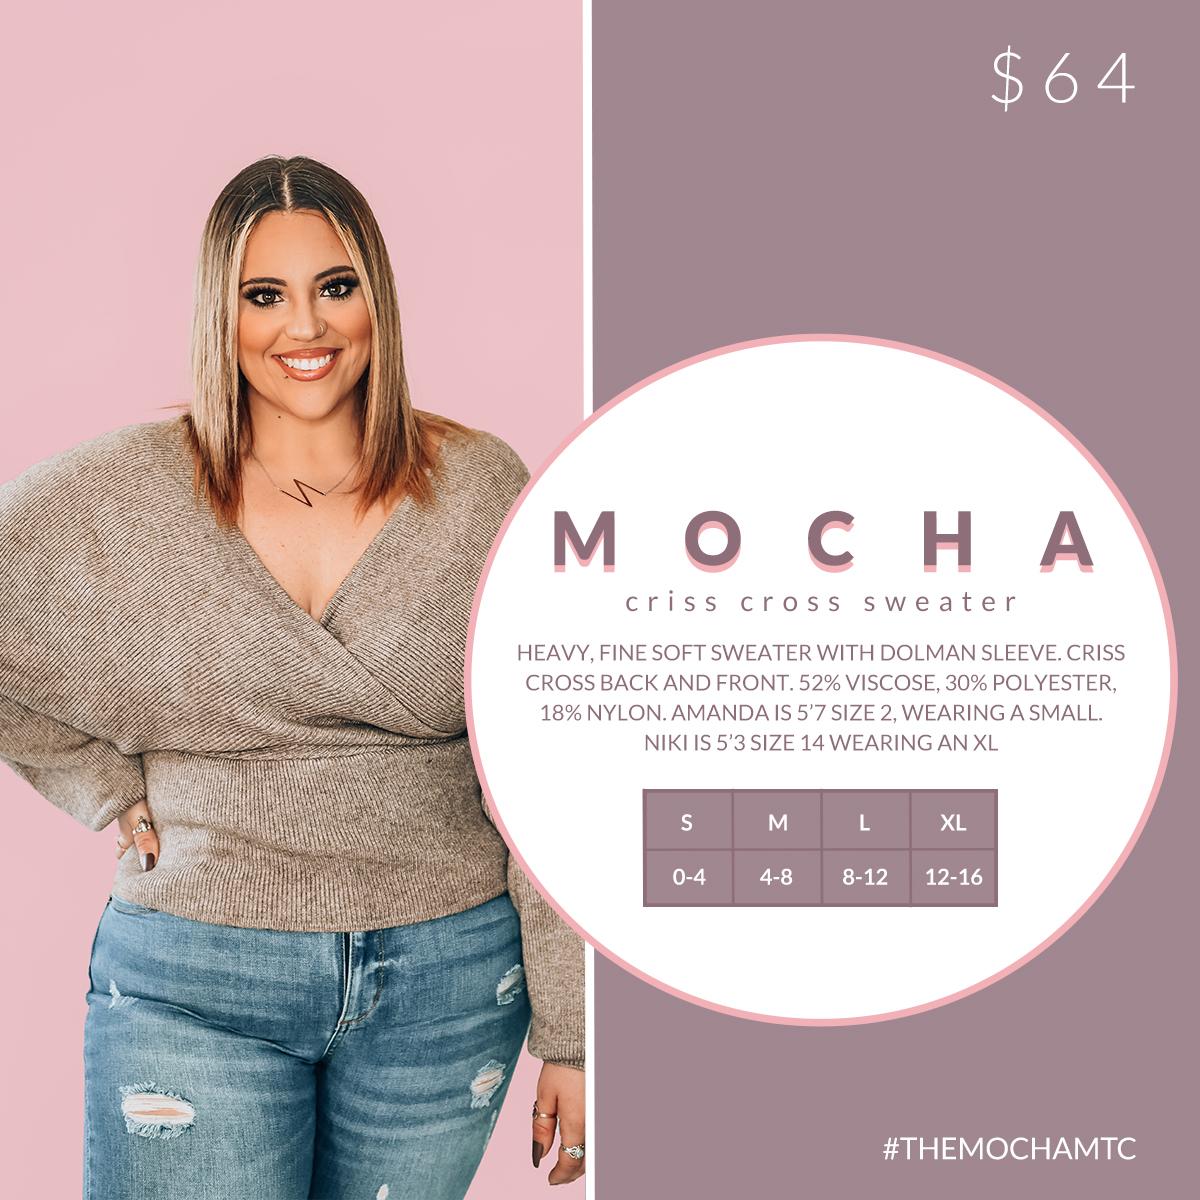 Image for MOCHA